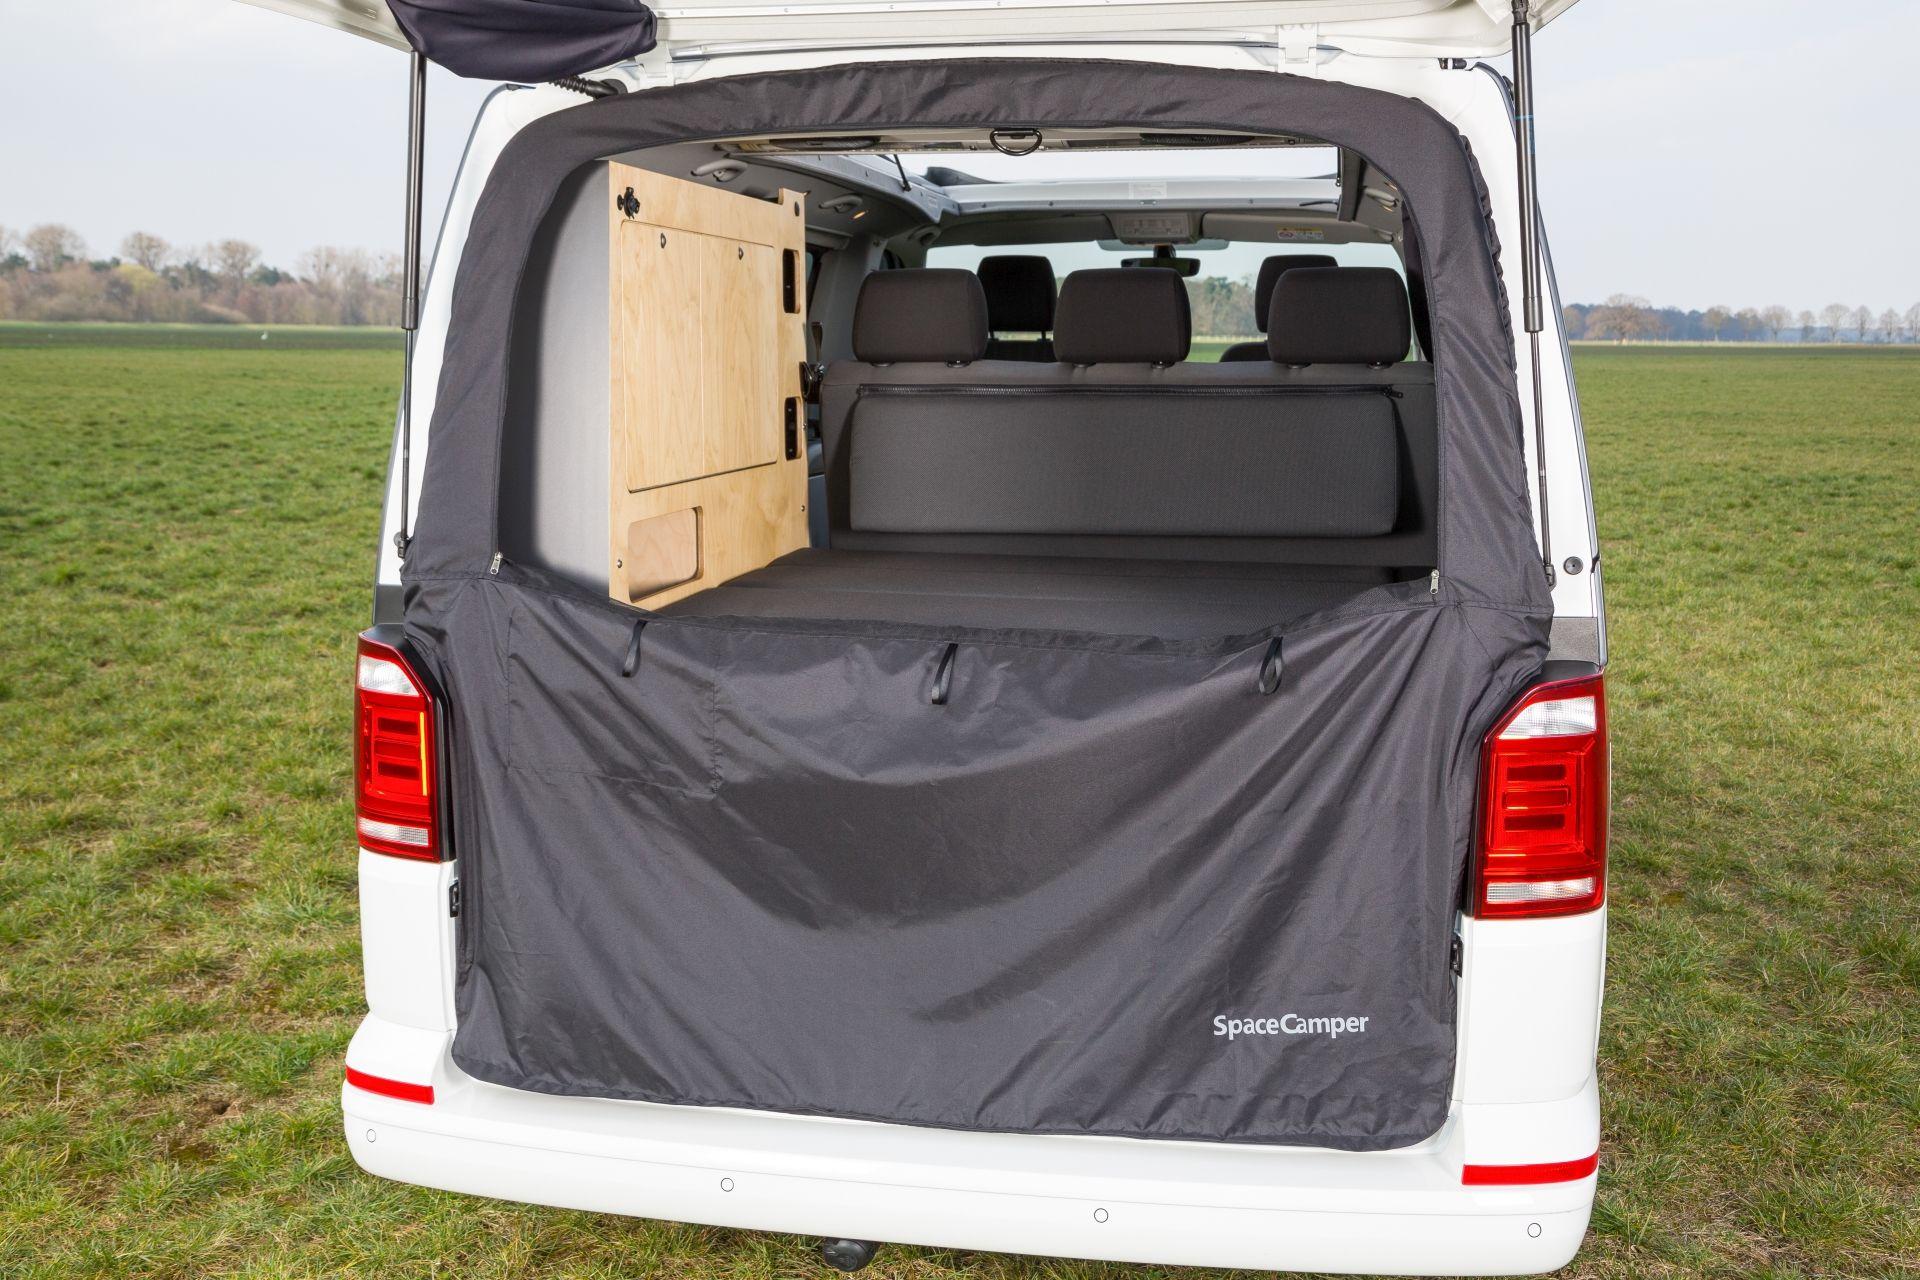 moskitonetz der spacecamper vw t6 camping ausbau reisemobil wohnmobil campingbus und. Black Bedroom Furniture Sets. Home Design Ideas